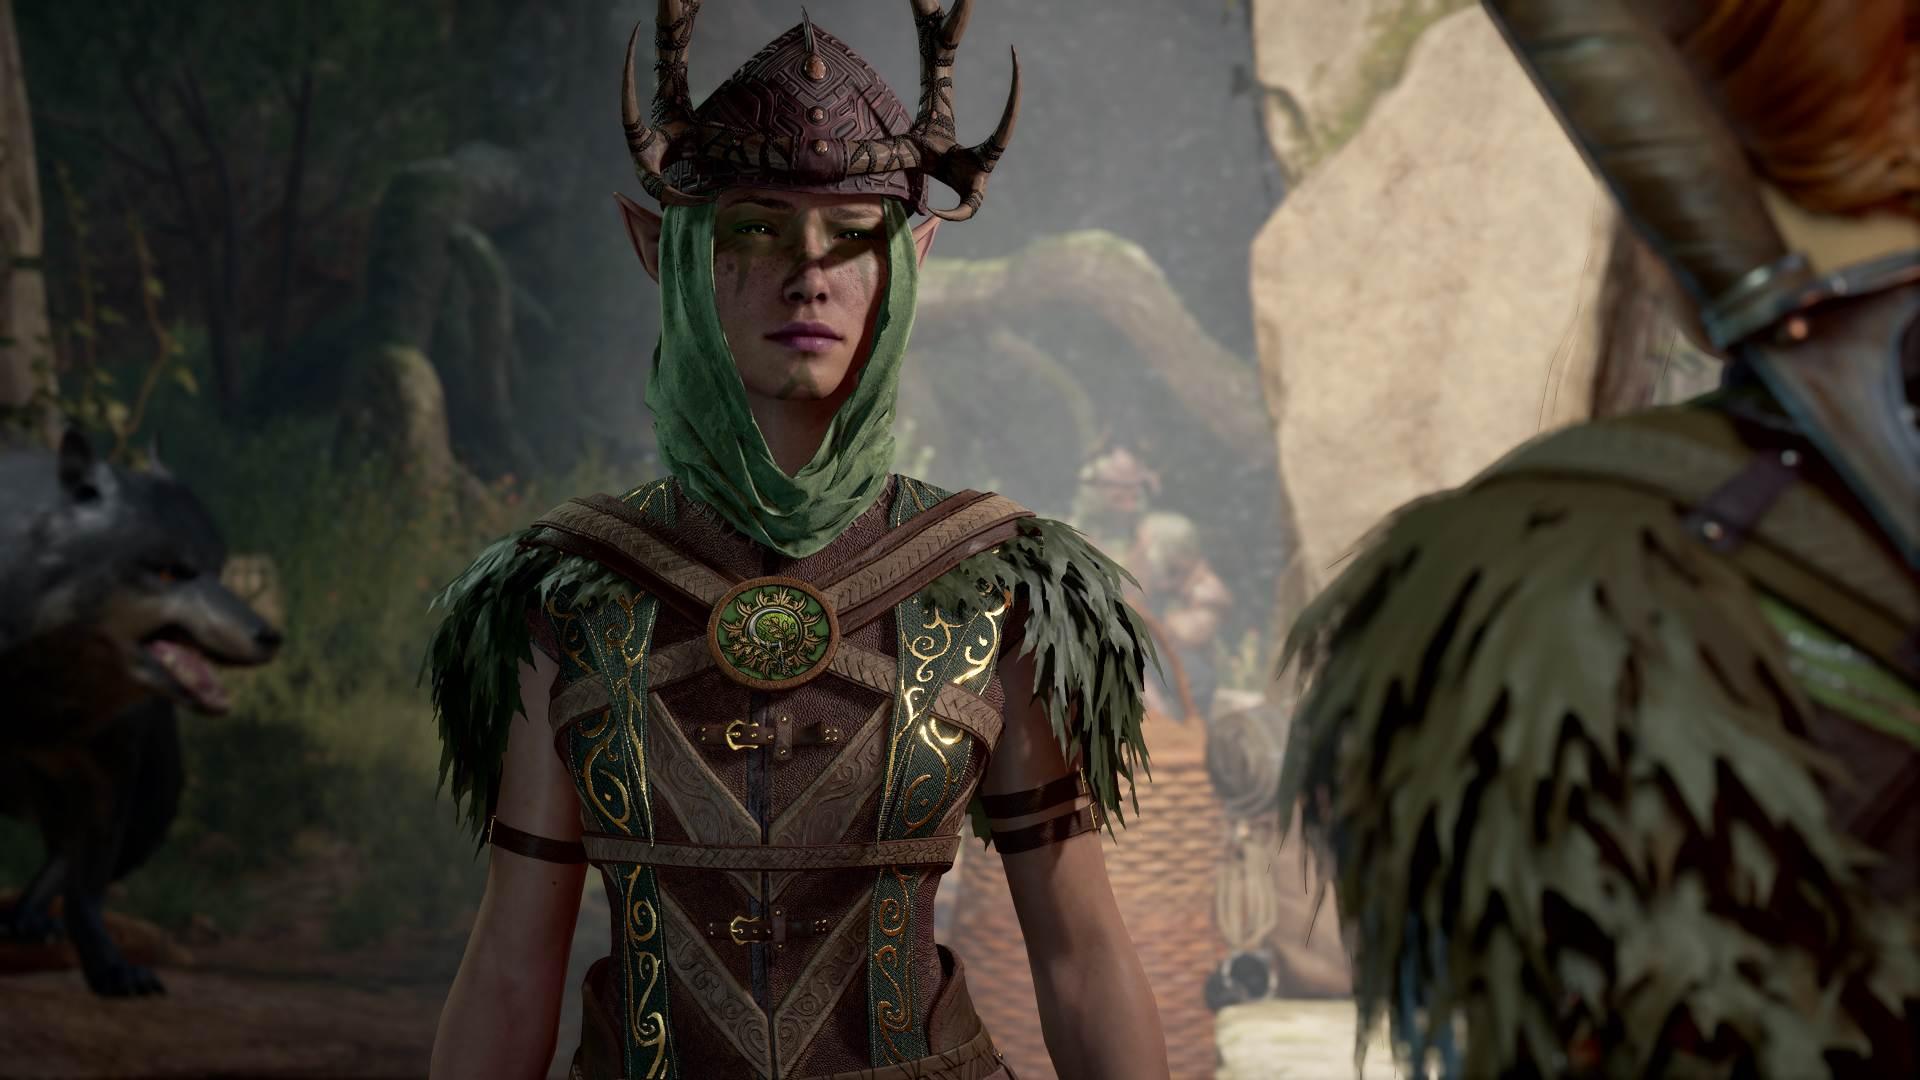 Larian founder Swen Vincke on dice, druids, and Baldur's Gate 3 screenshot